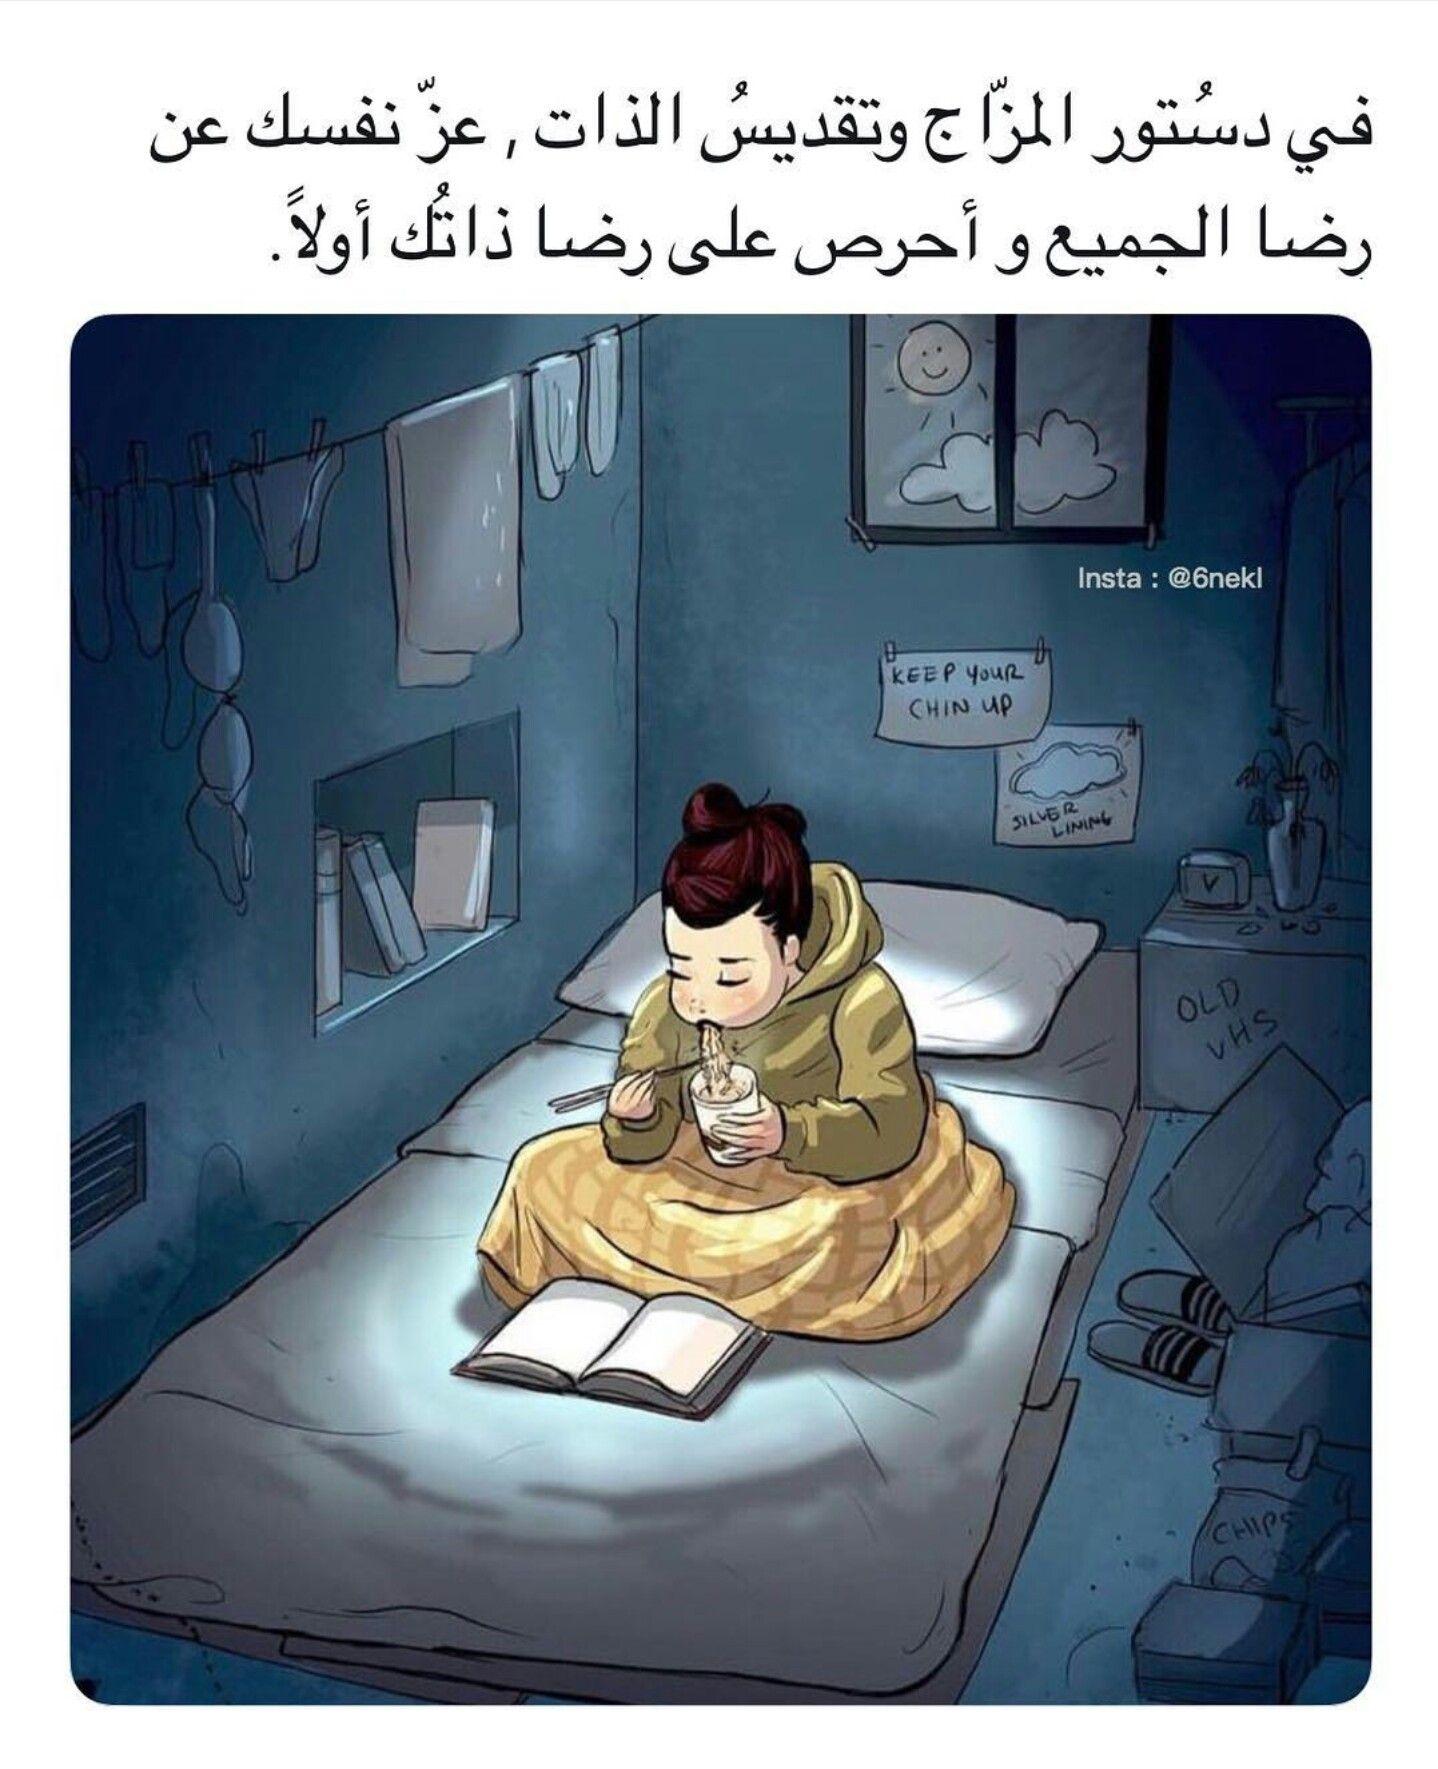 لا يهم ان رضا الناس عني او لا Funny Arabic Quotes Arabic Quotes Wonder Quotes